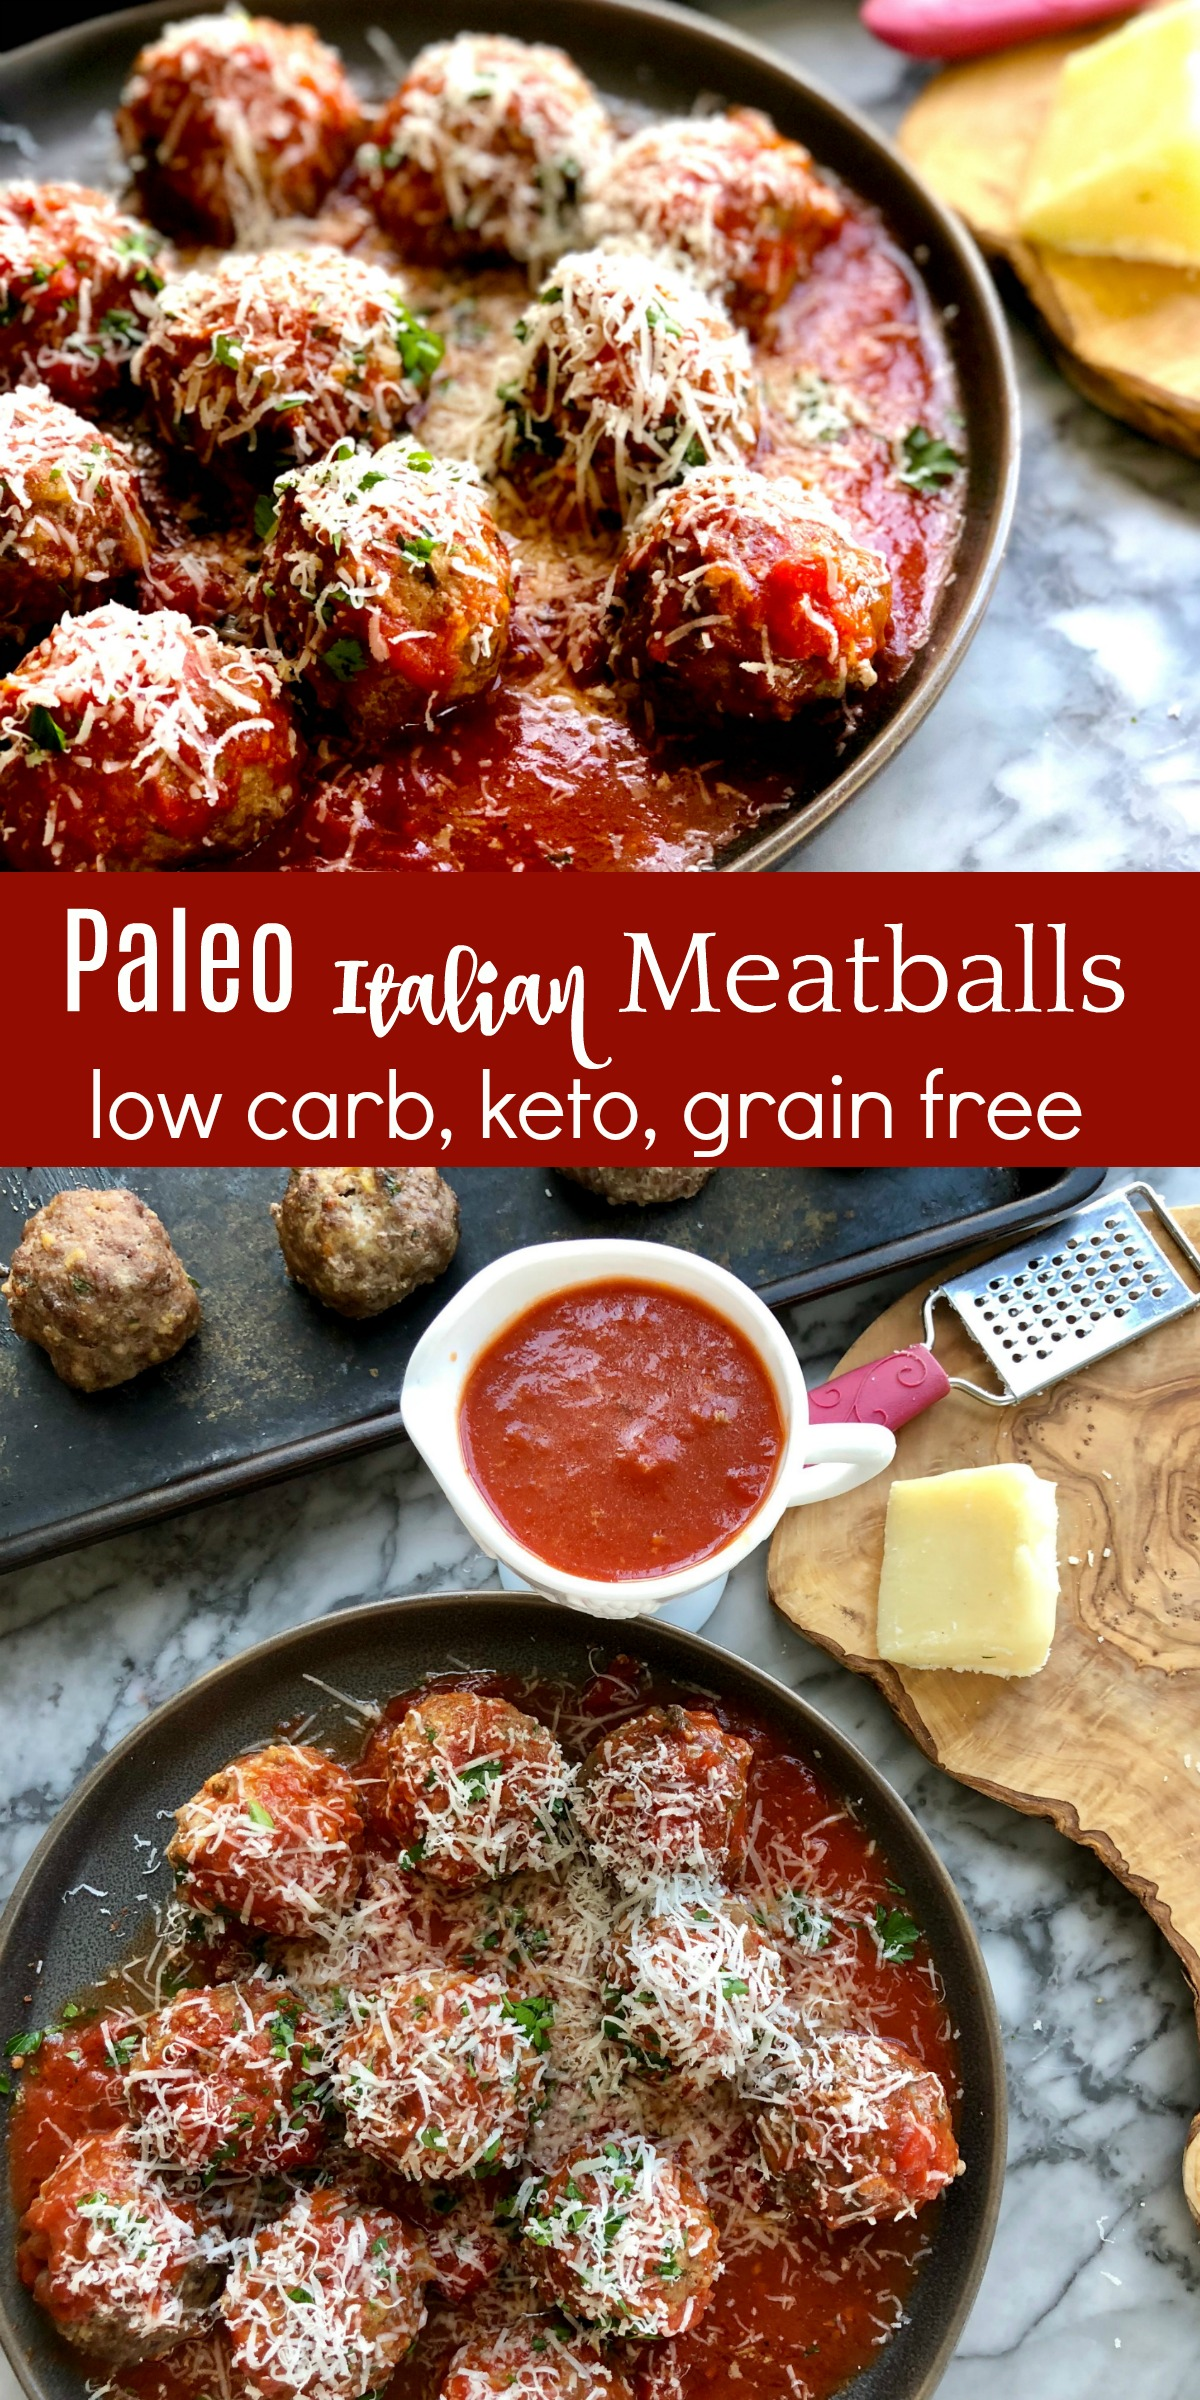 Paleo Meatballs for a grain free, keto friendly dinner. Also loves mozzarella and ricotta cheese. #paleomeatballs #ketomeatballs #spinchtiger via @angelaroberts